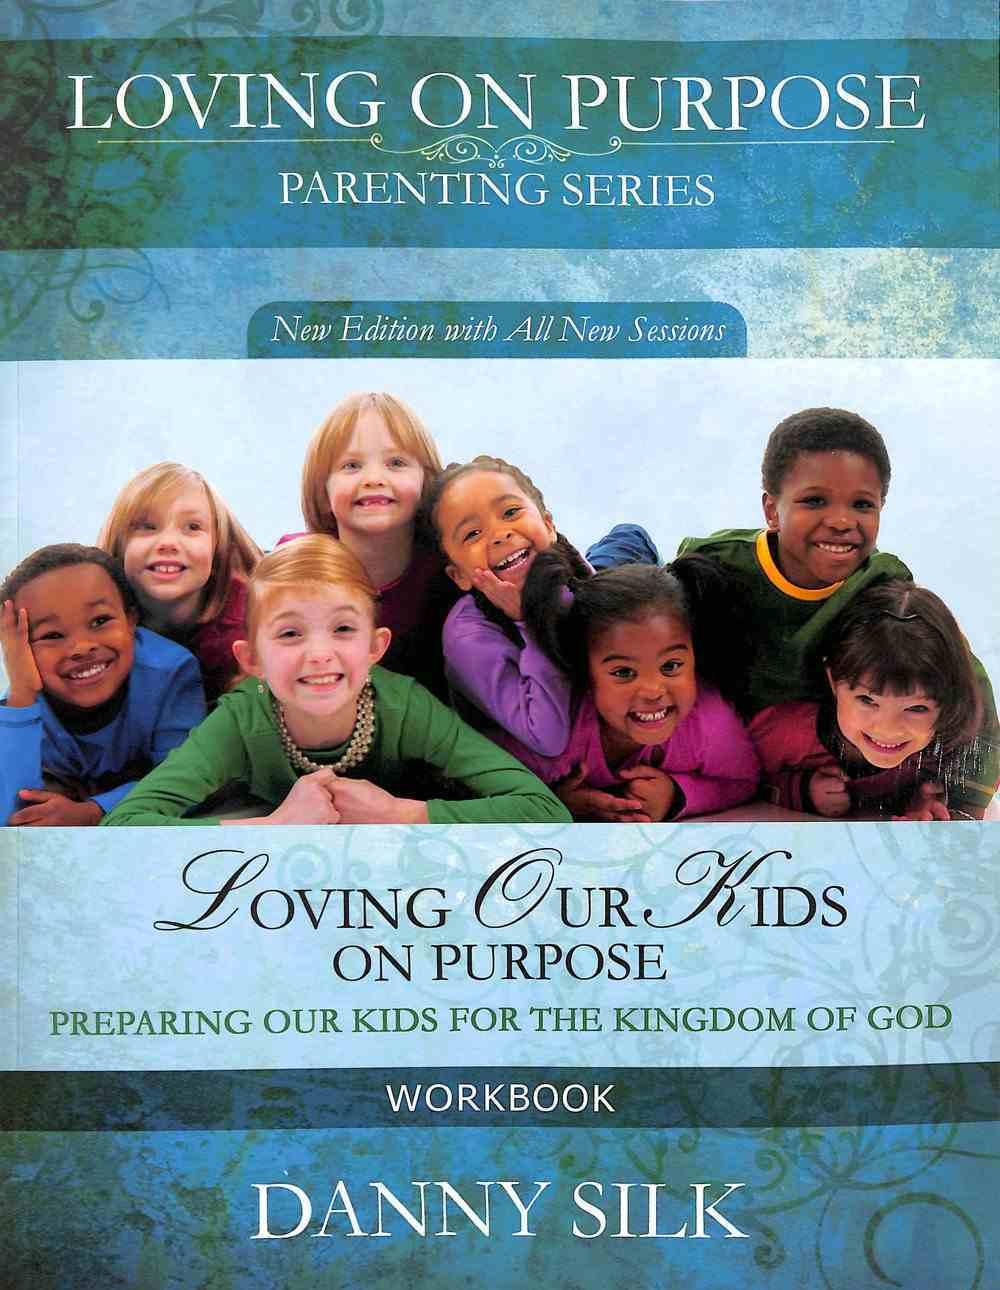 Loving Our Kids on Purpose (Workbook) Paperback